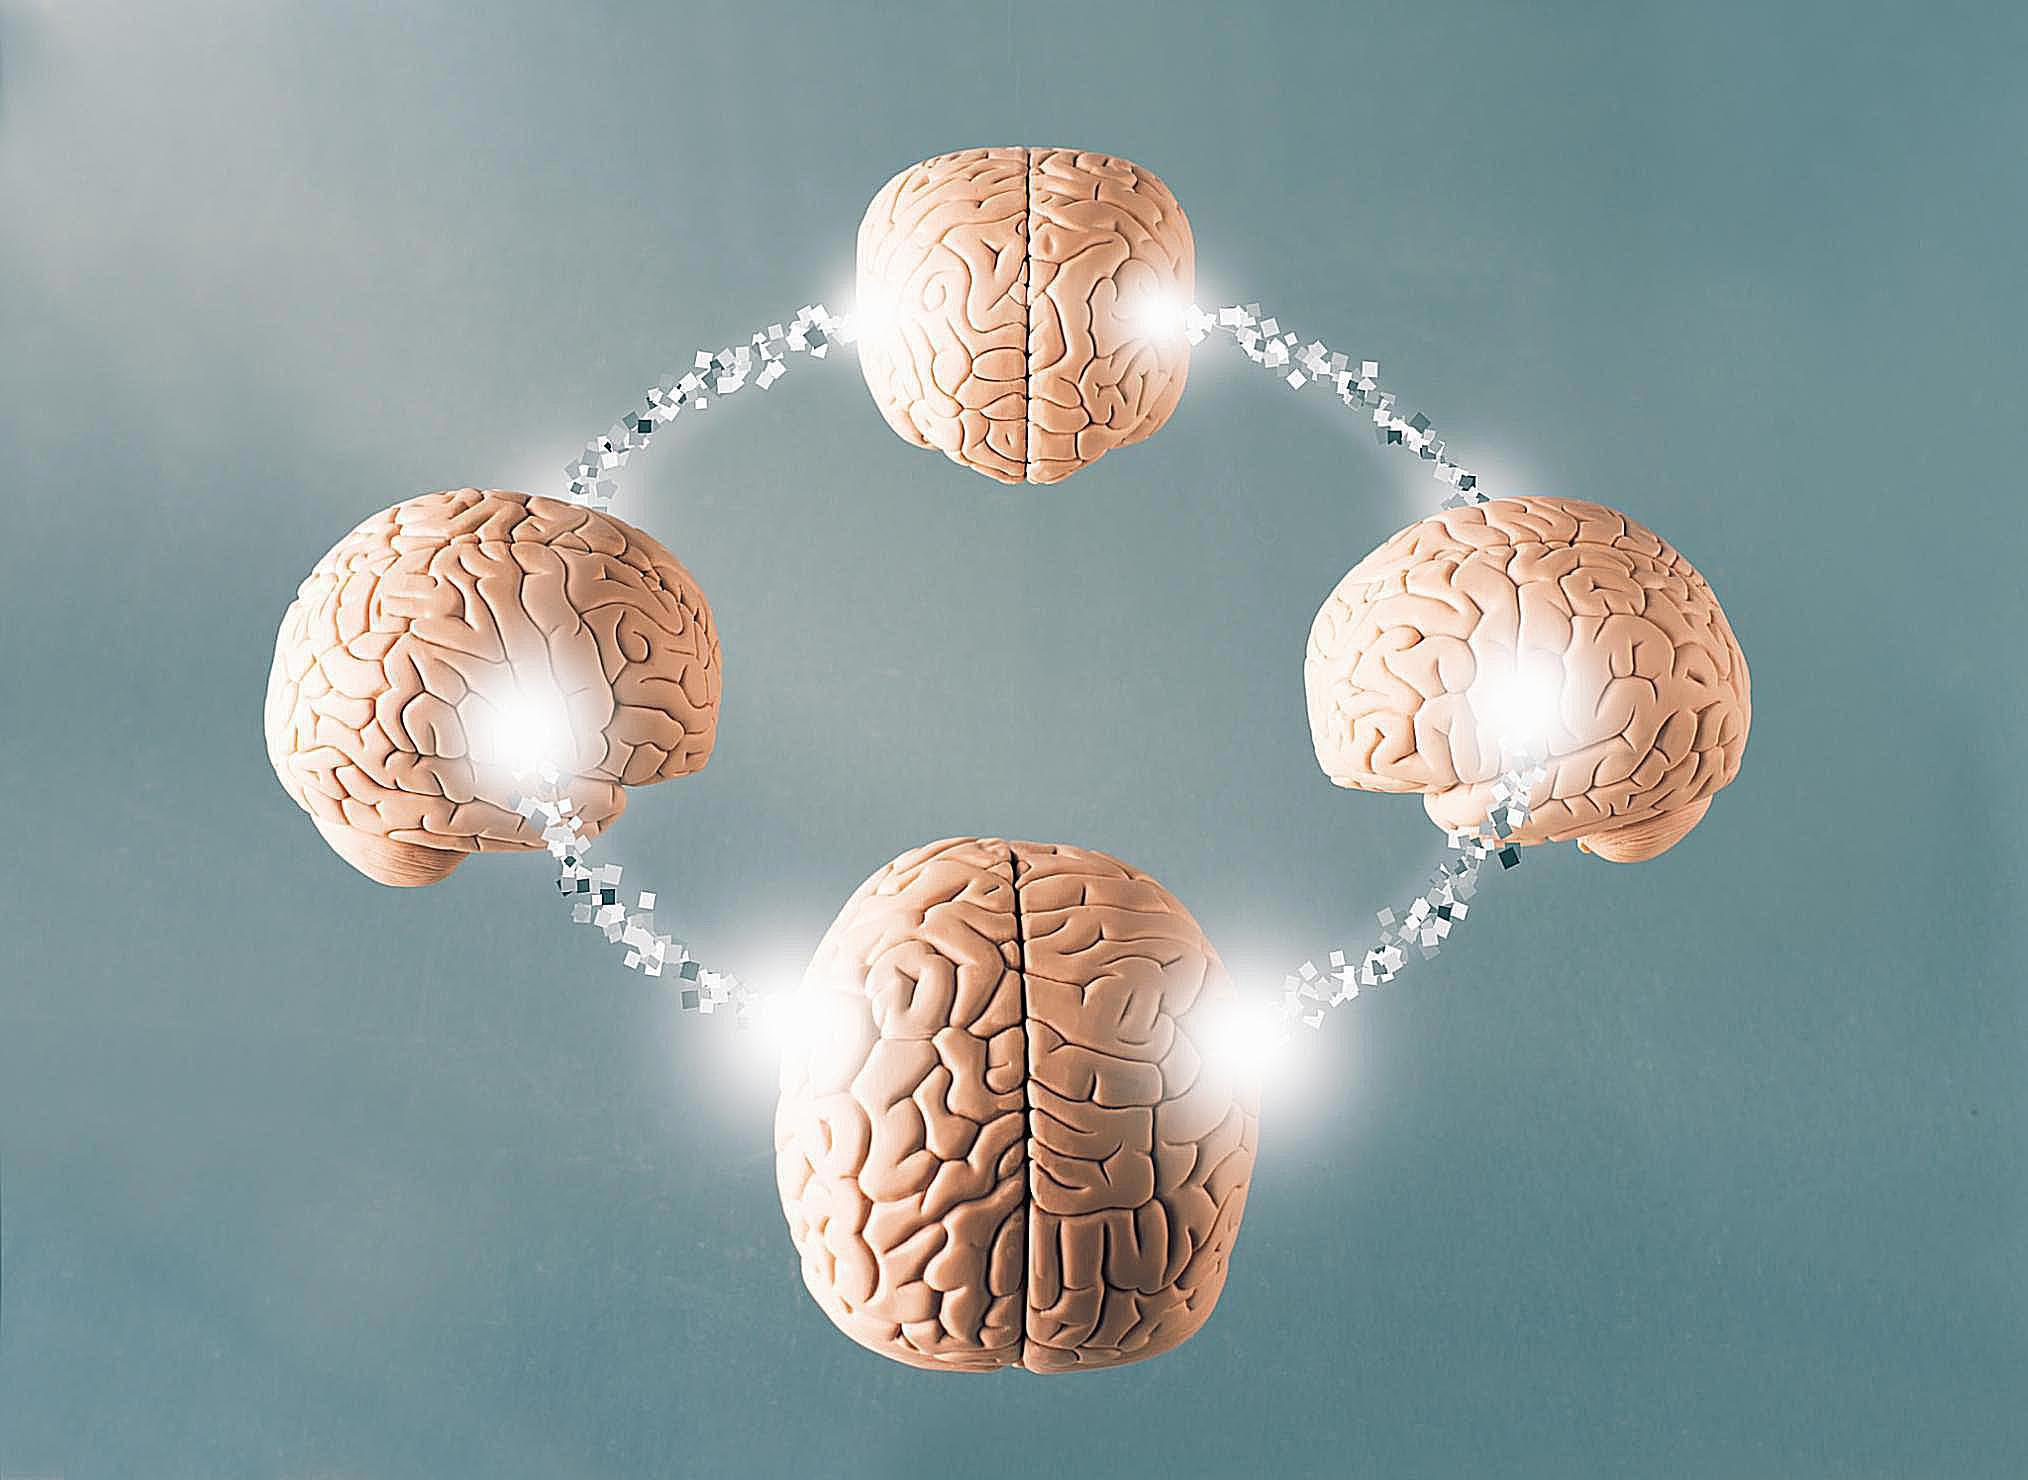 Understanding Howard Gardner's Theory of Multiple Intelligence